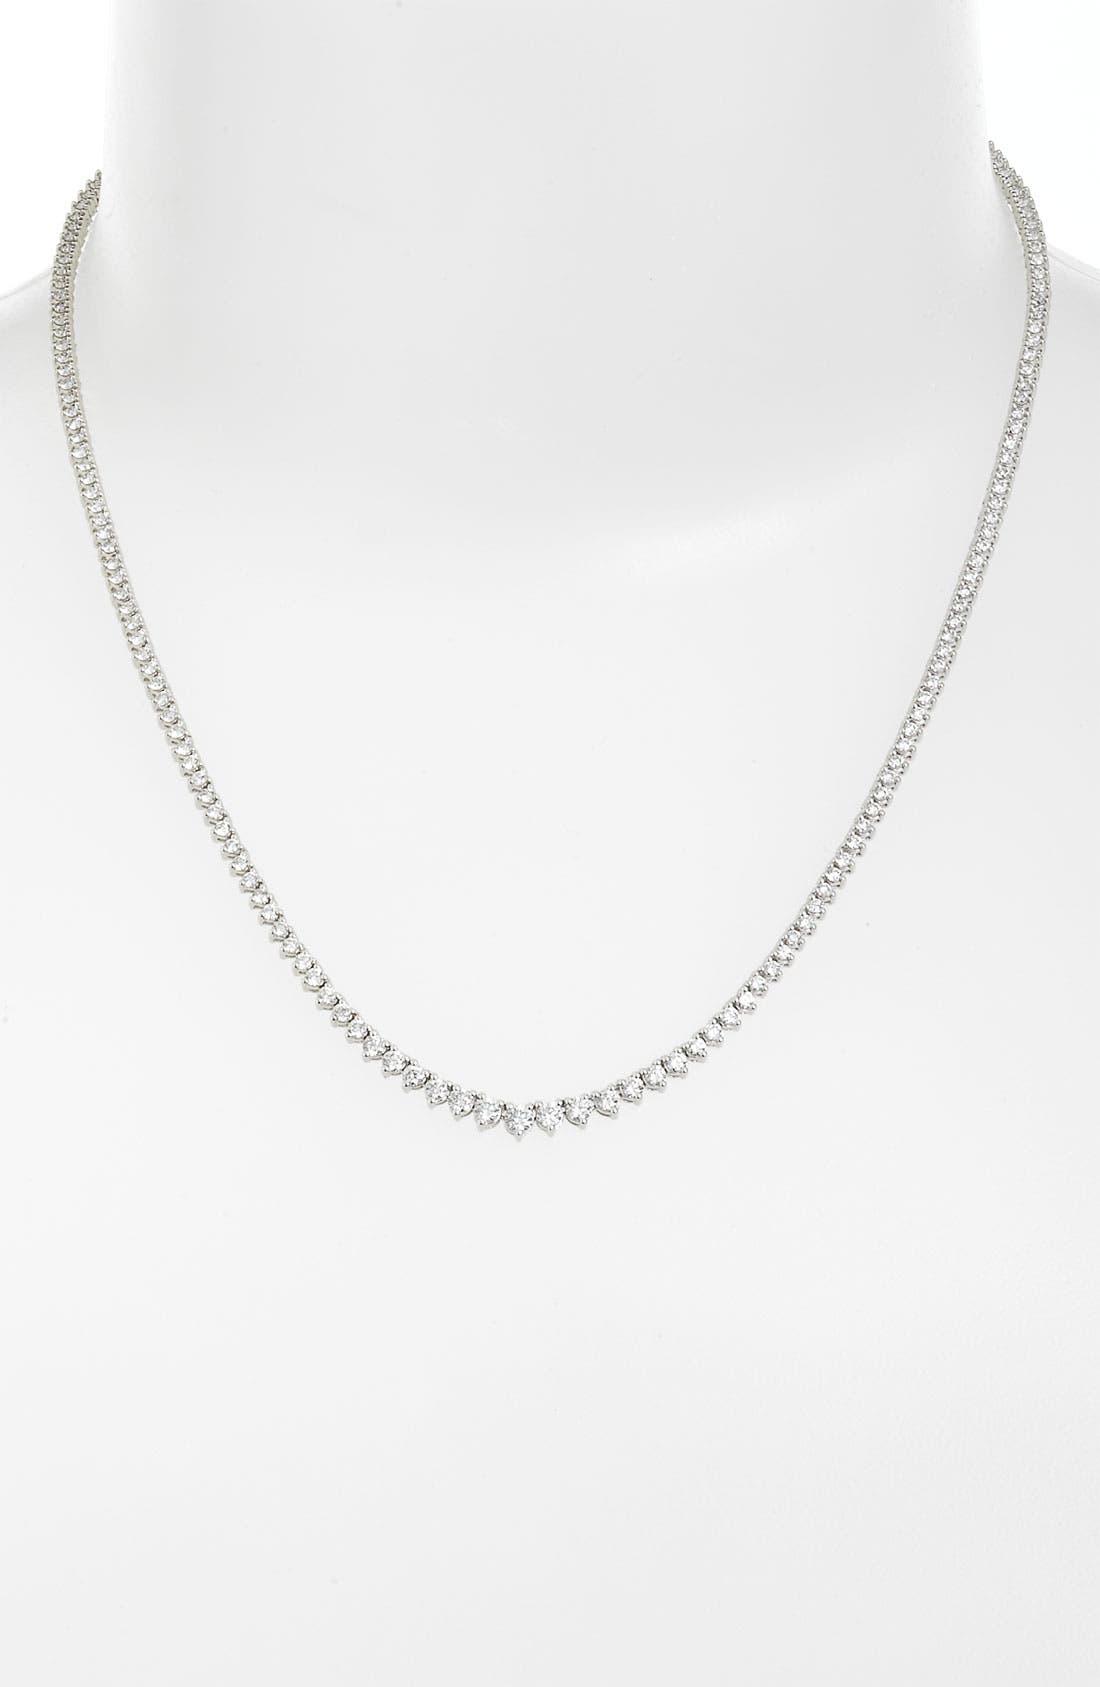 Main Image - Bony Levy 4.25ct tw Diamond Tennis Necklace (Nordstrom Exclusive)